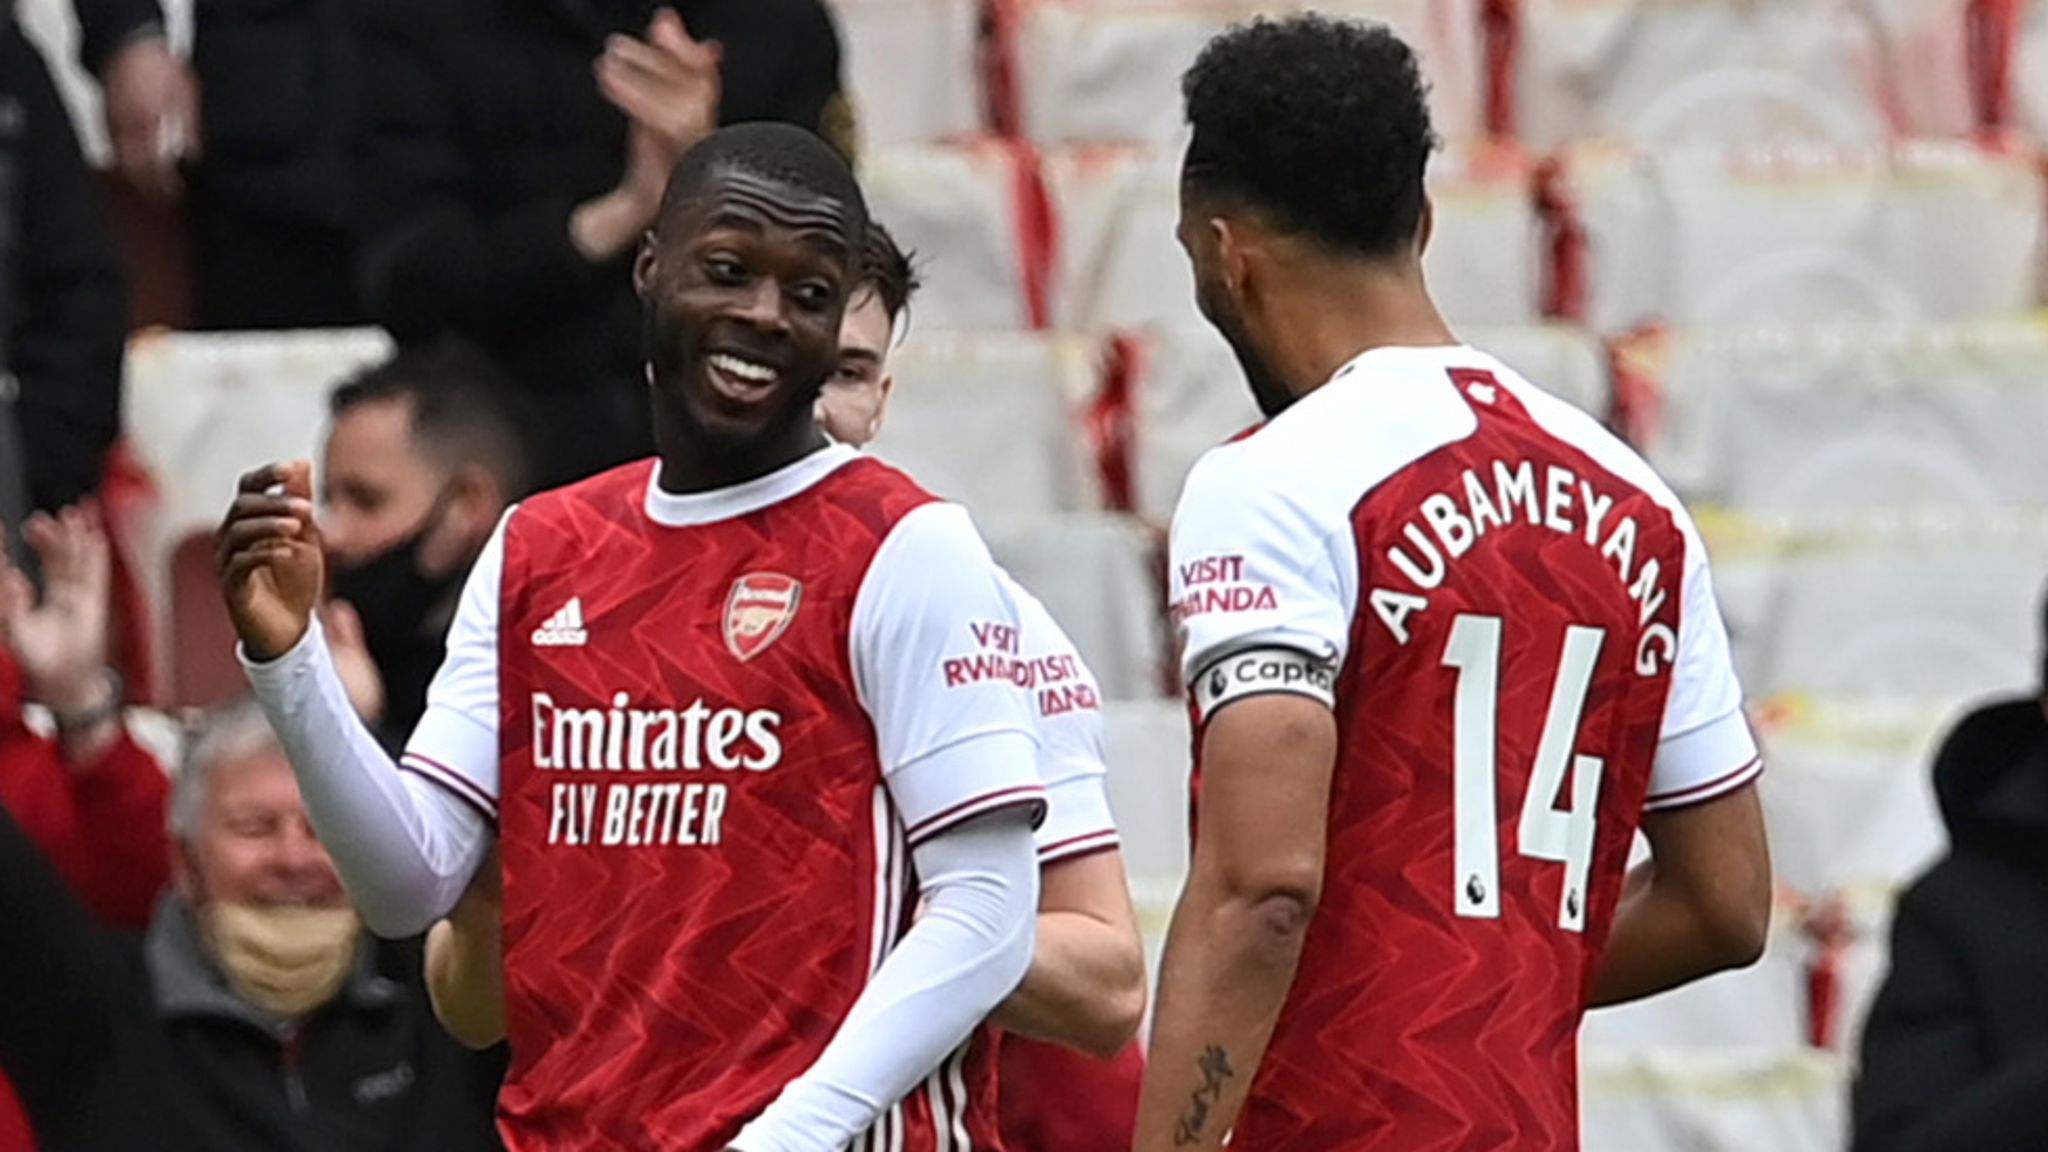 Arsenal 2 - 0 Brighton - Match Report & Highlights